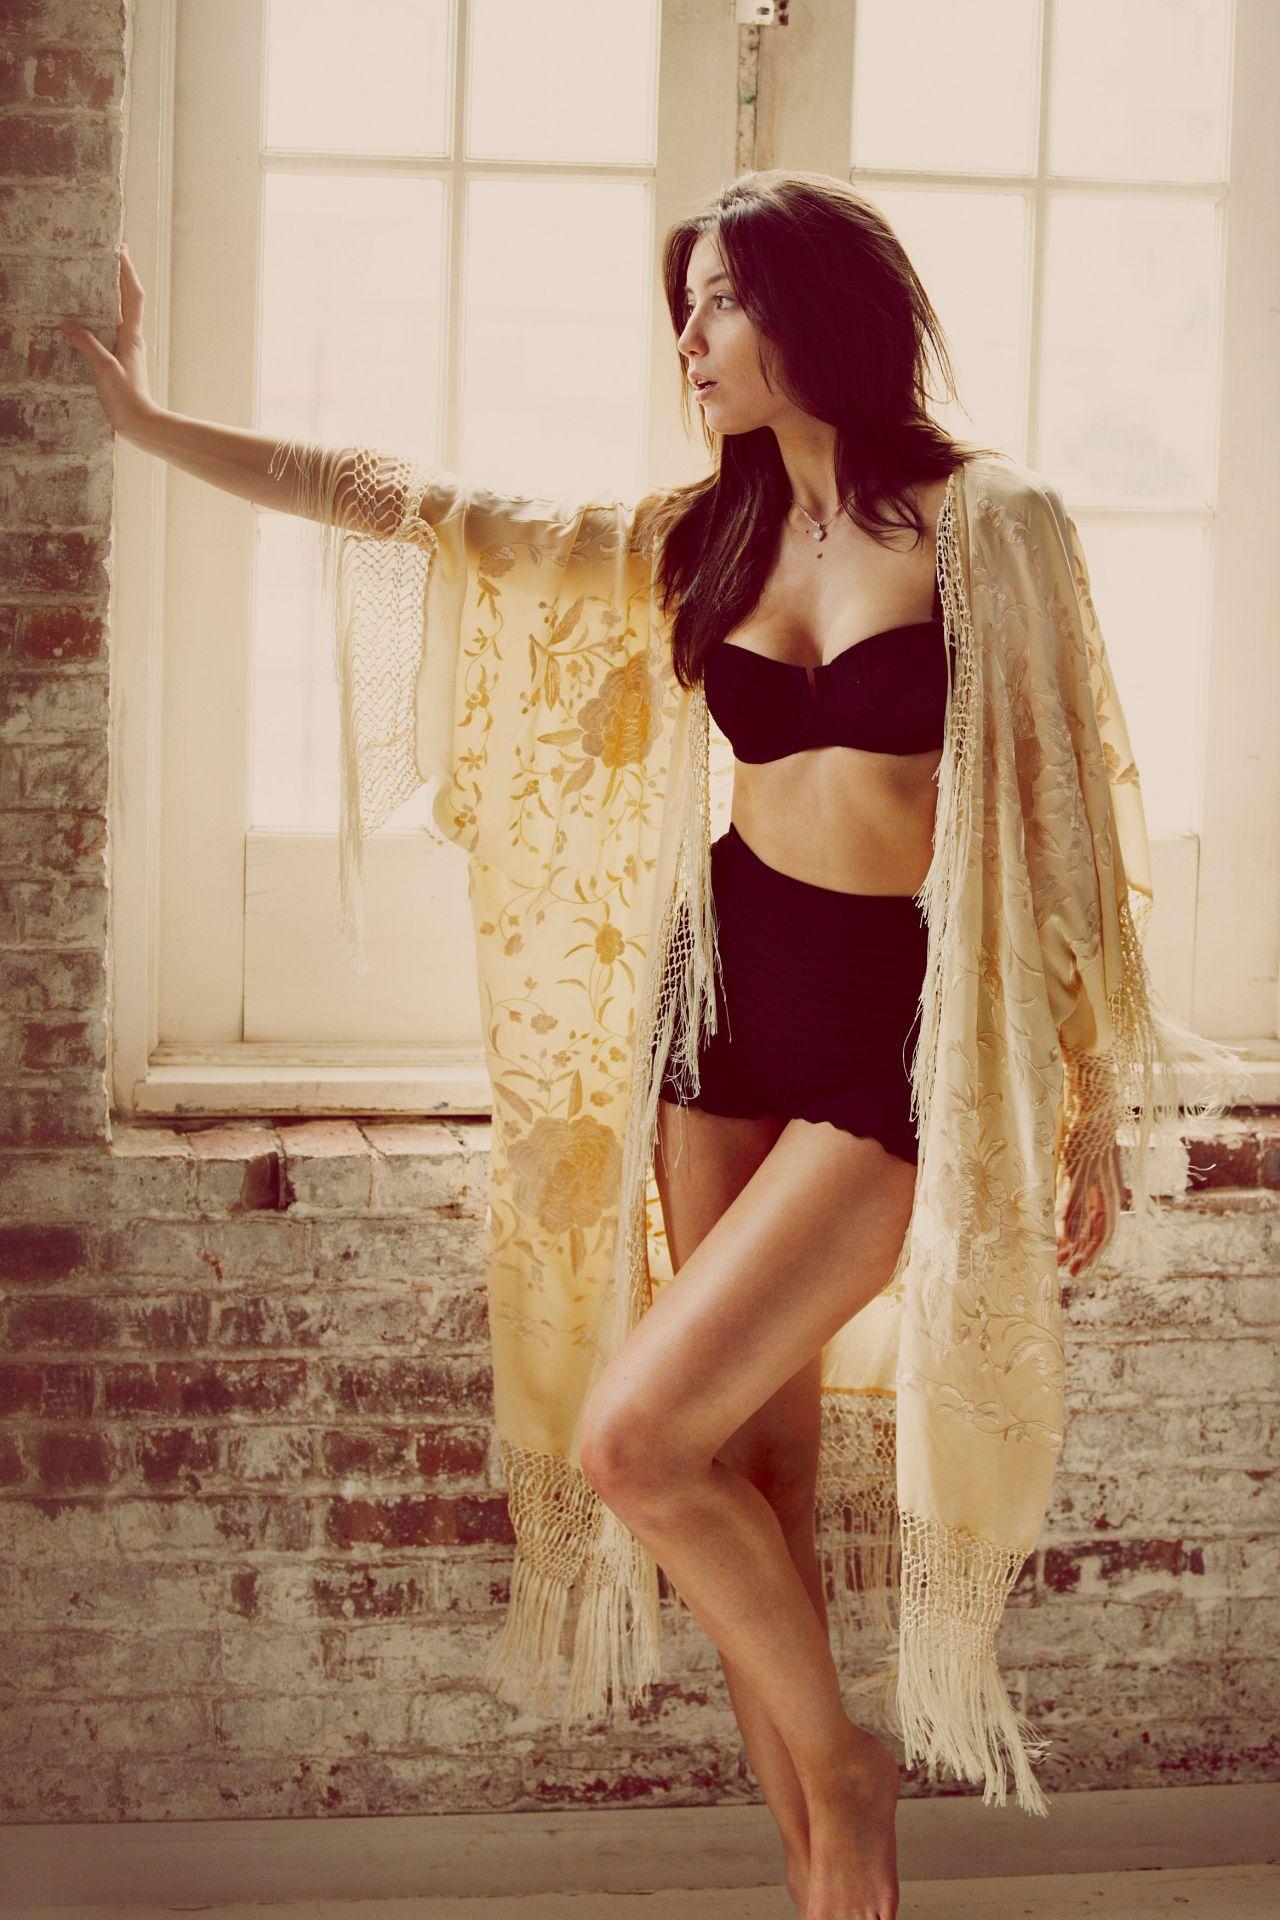 Daisy Lowe Free People Intimates Photoshoot 2013